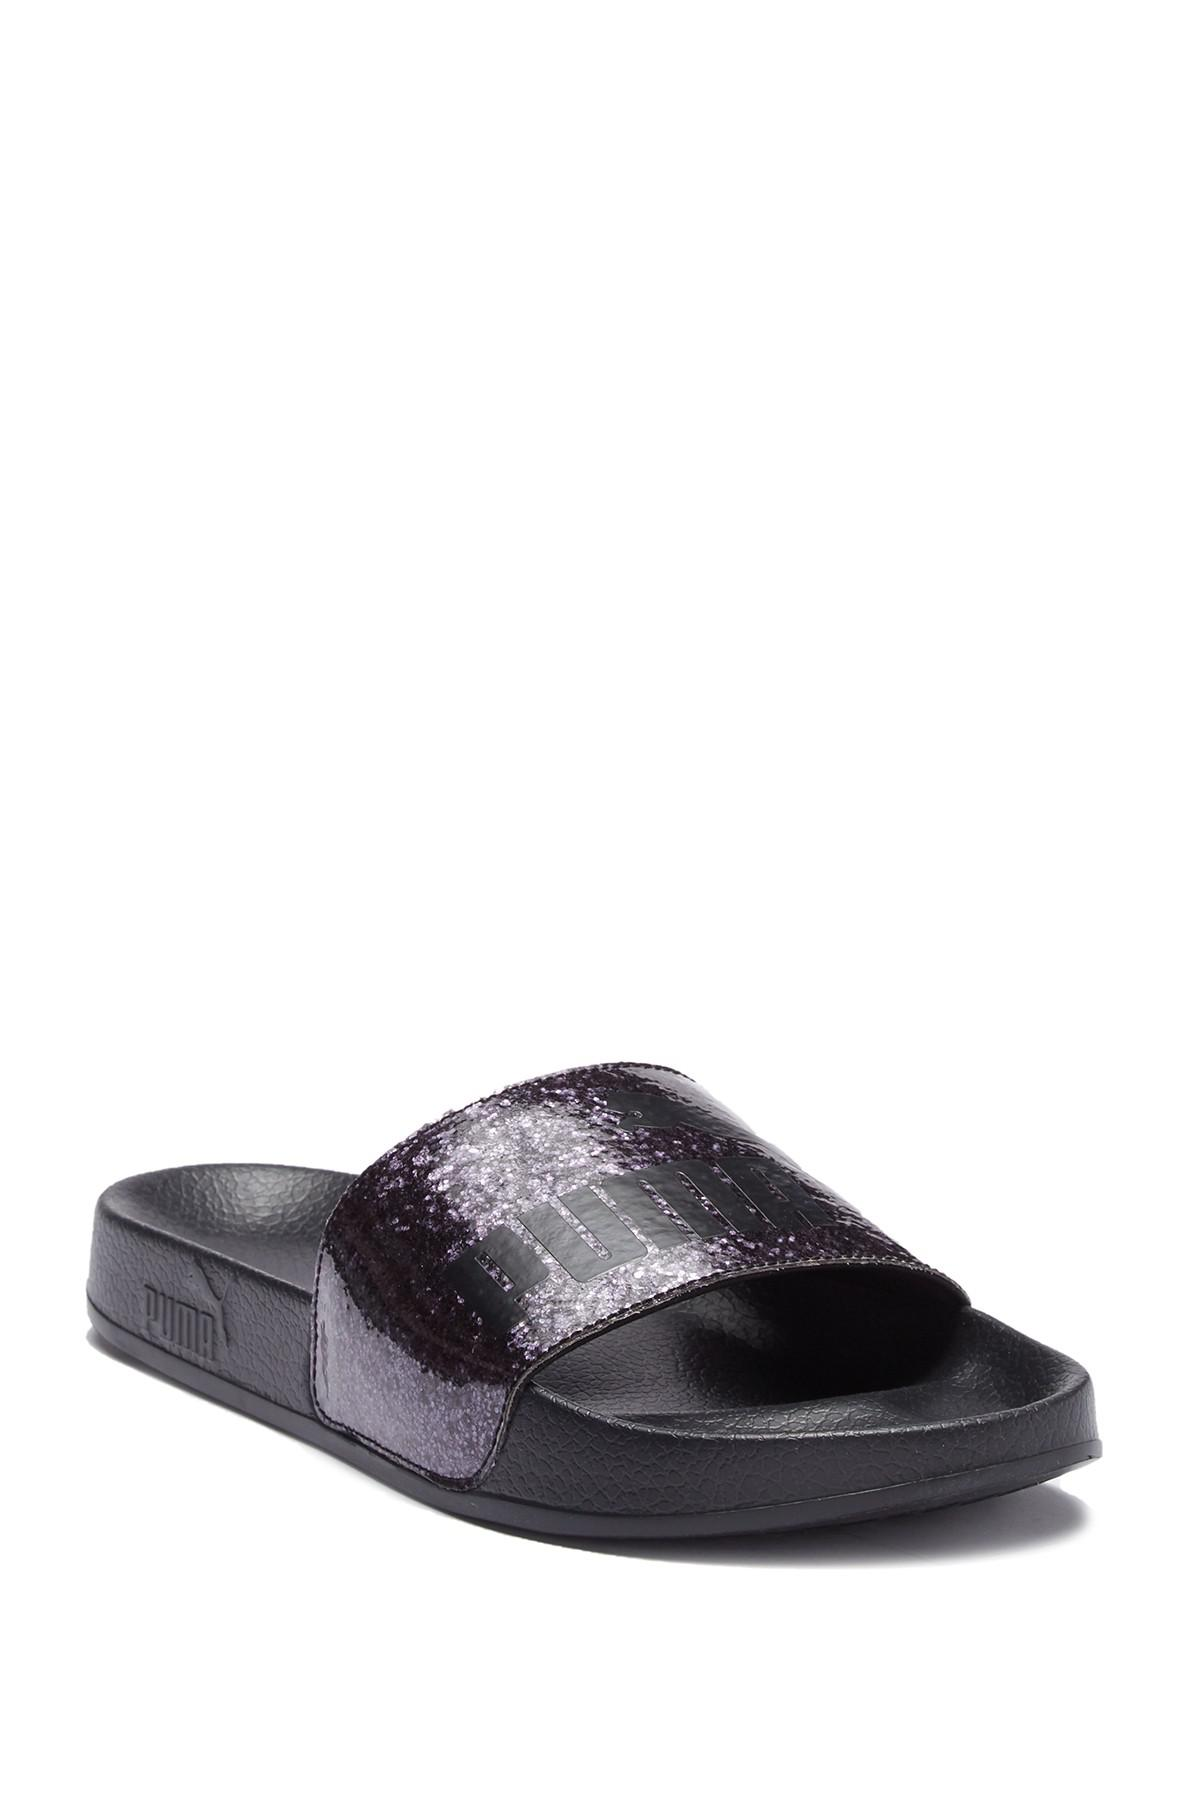 59dc6842d03e93 Lyst - PUMA Leadcat Glitz Slide Sandal in Black